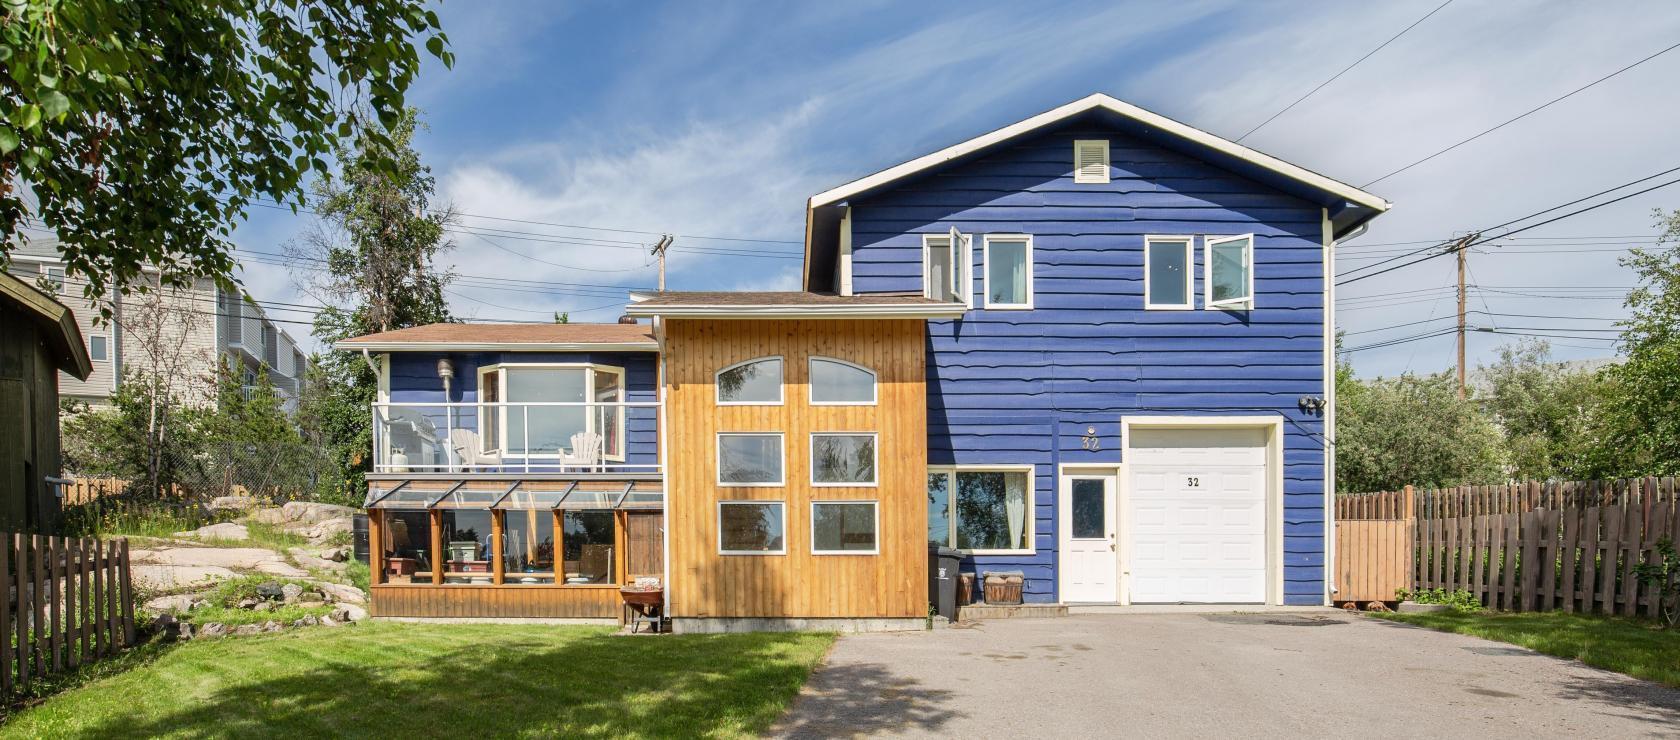 32 Calder Crescent, Frame Lake, Yellowknife 2